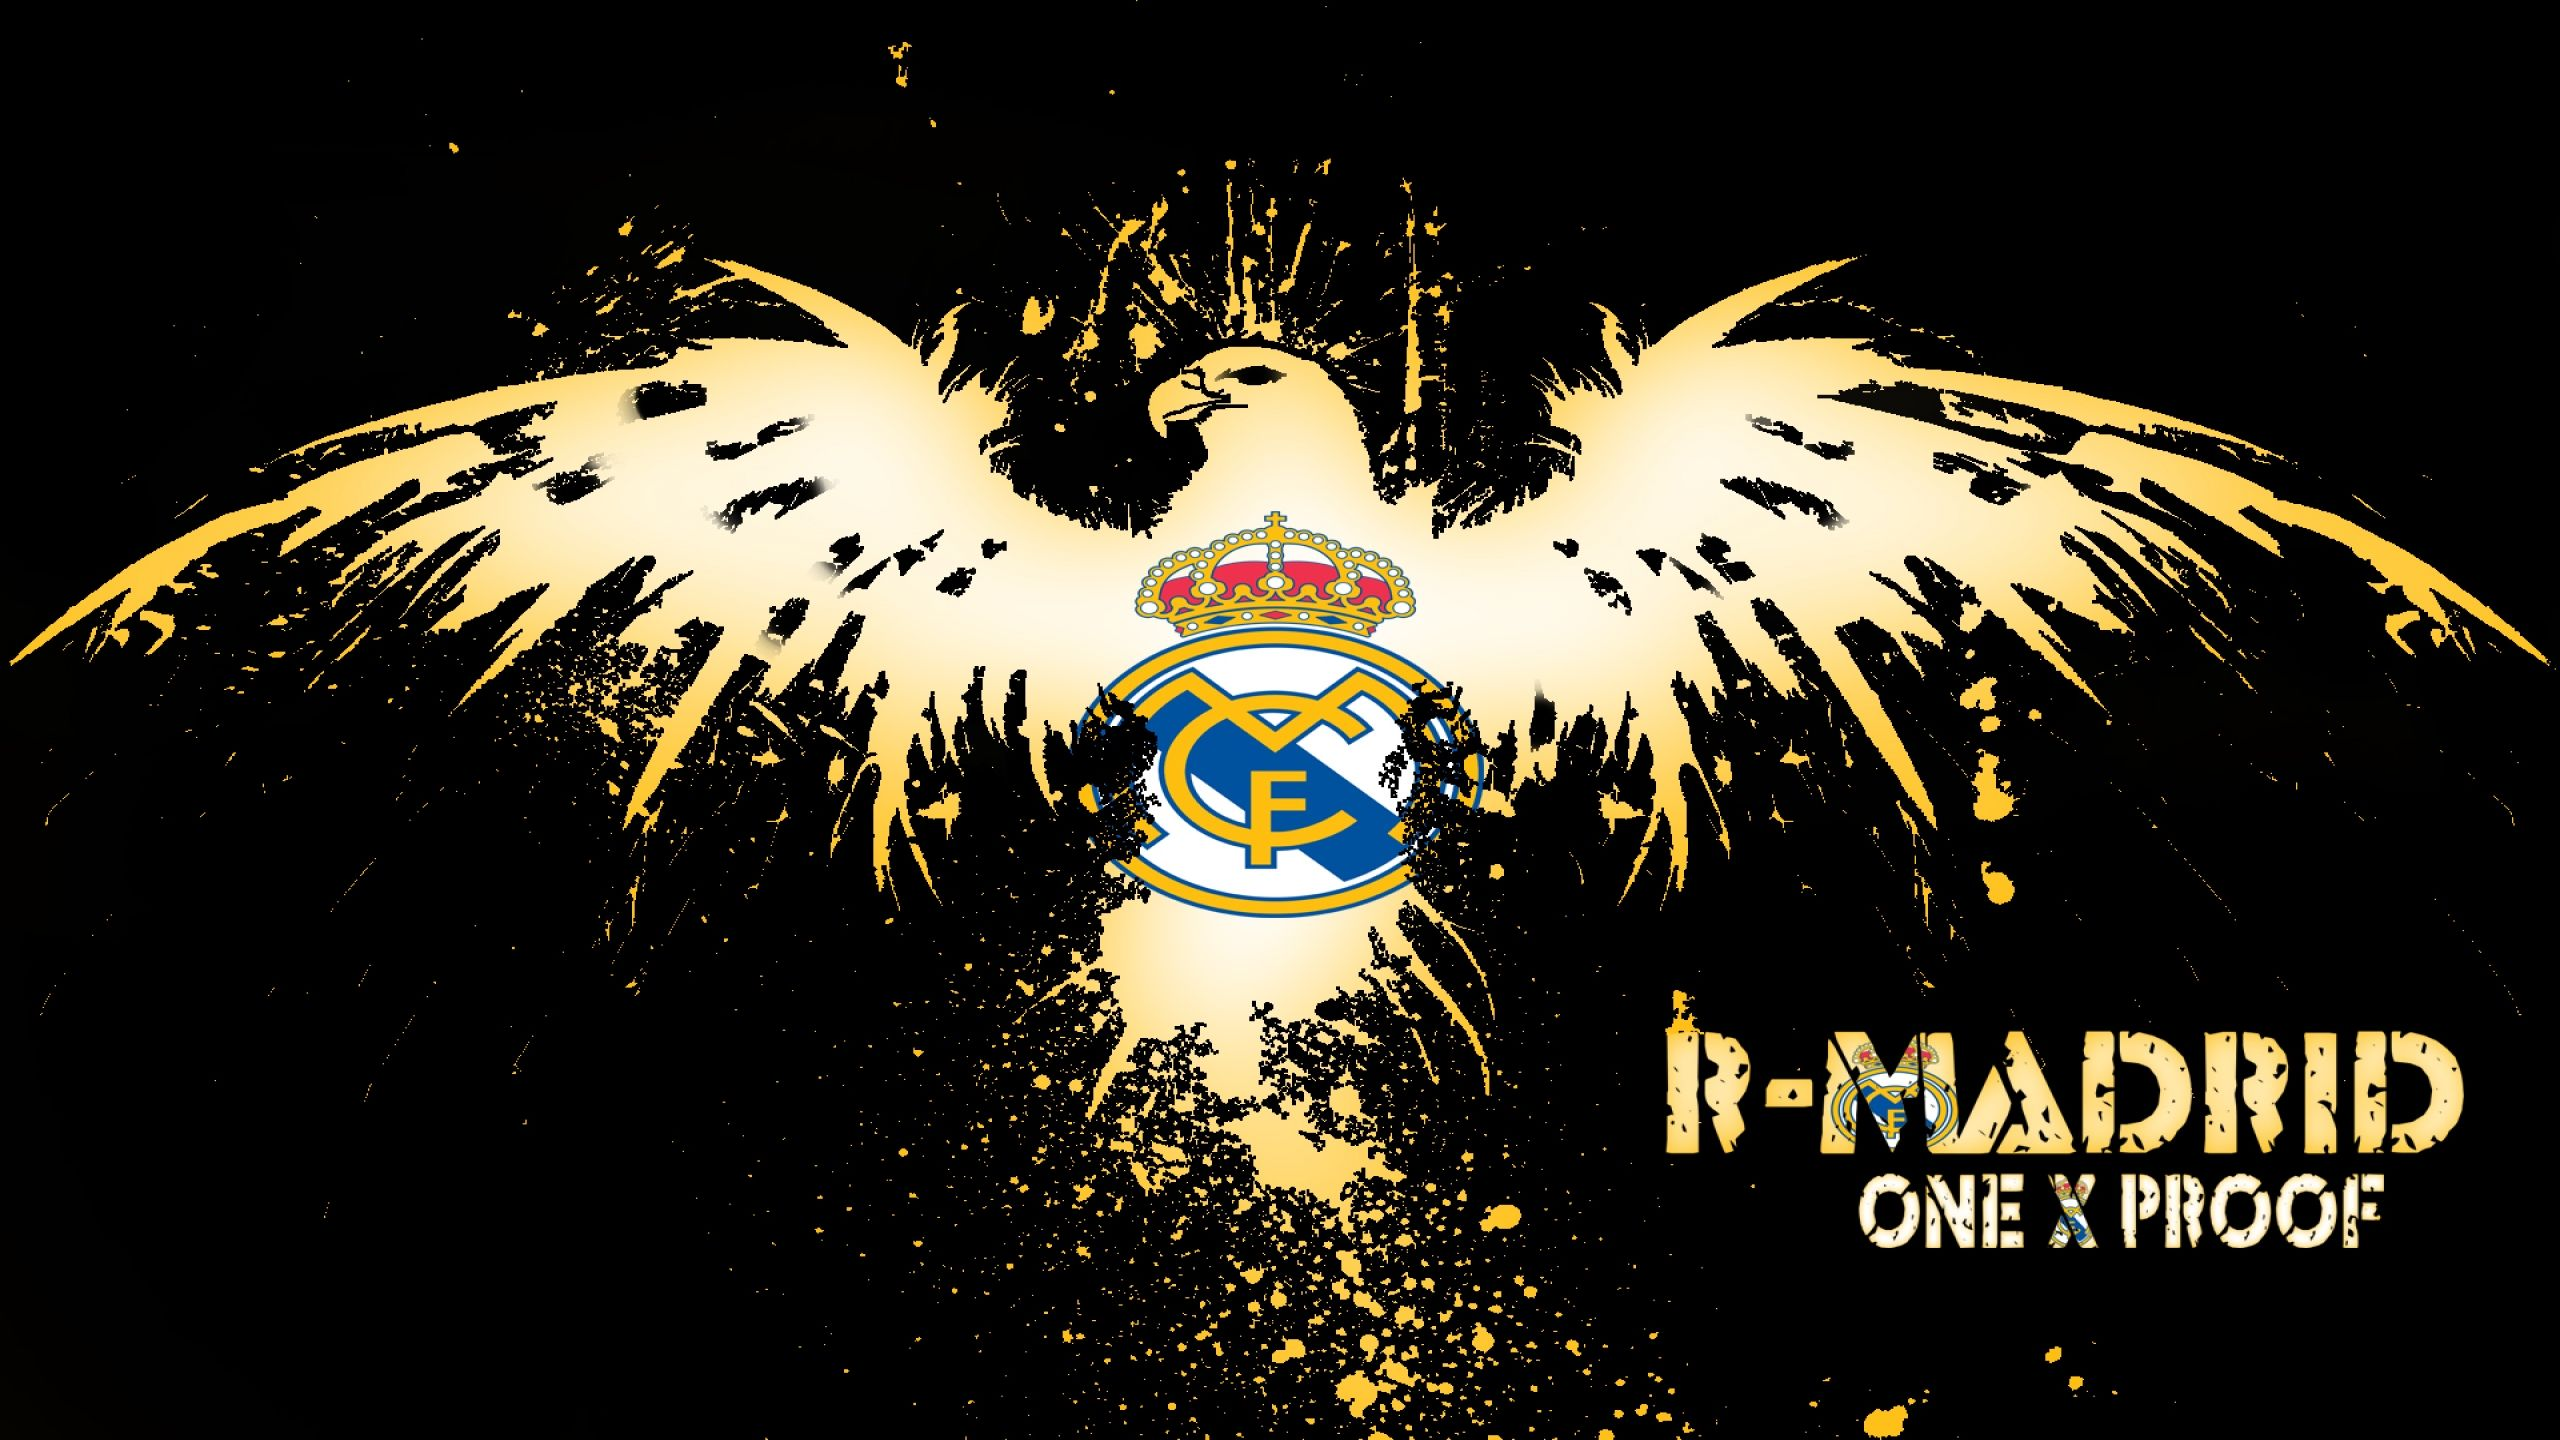 Real Madrid Soccerway Best Wallpaper Hd Real Madrid Wallpapers Real Madrid Logo Wallpapers Madrid Wallpaper